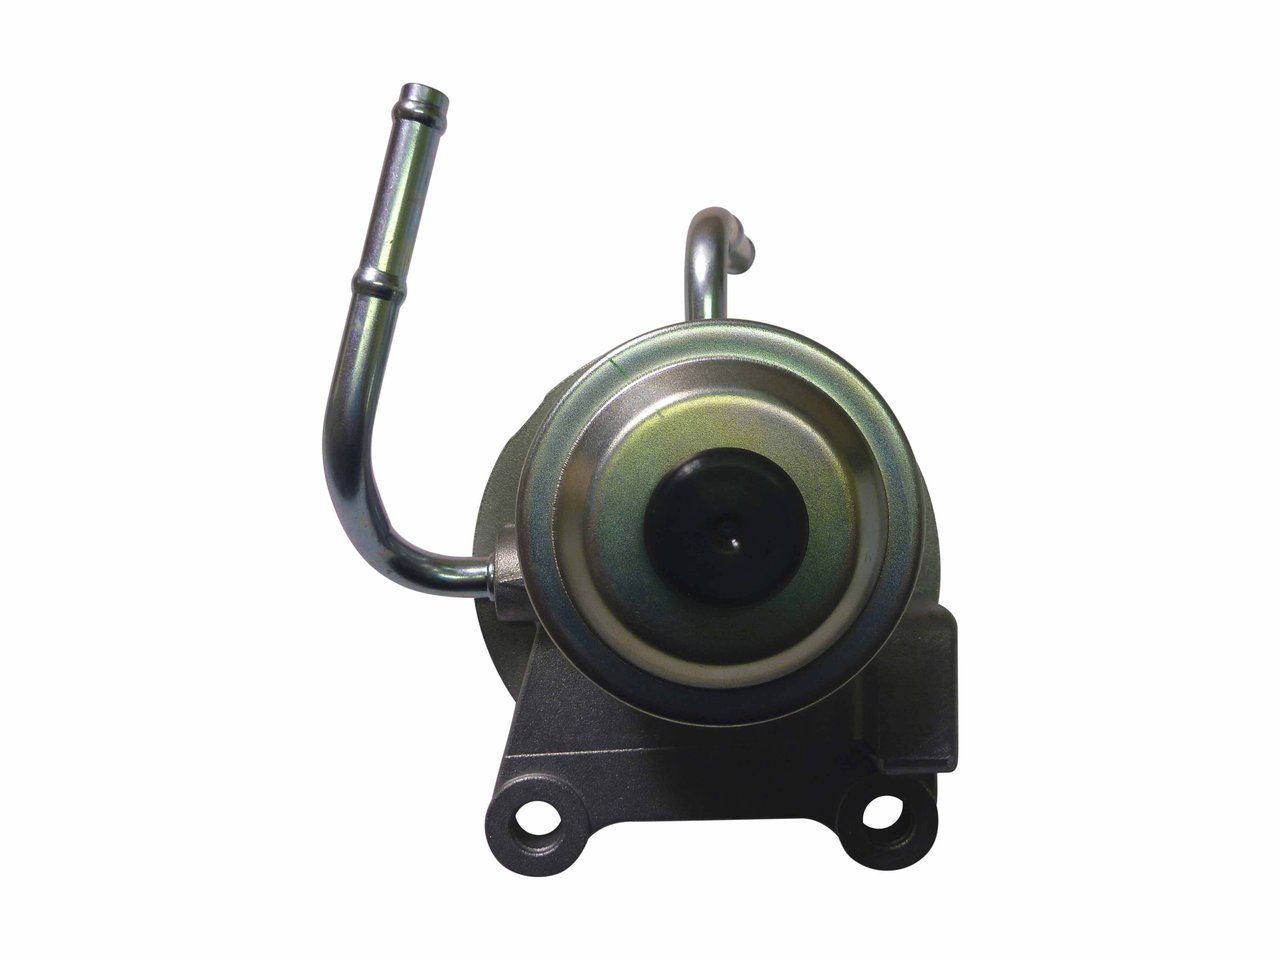 Diesel Fuel Filter Cap With Primer Pump Suitable For Hilux Ebay Wiring Diagram Vigo Champ Item Specifics